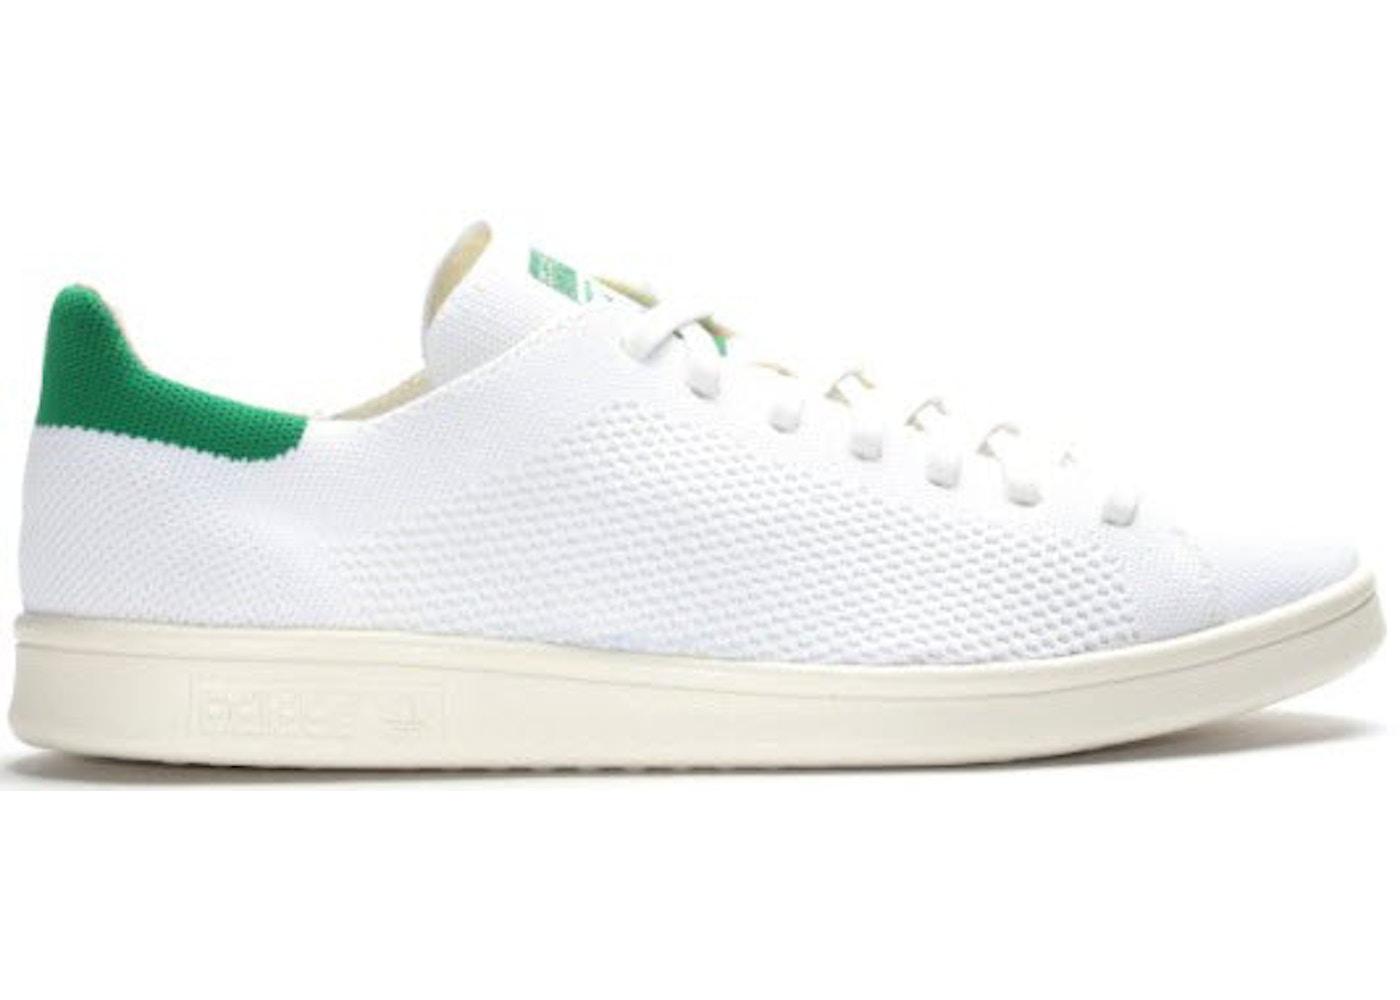 b875579a7df adidas Stan Smith Primeknit White Green - S75146